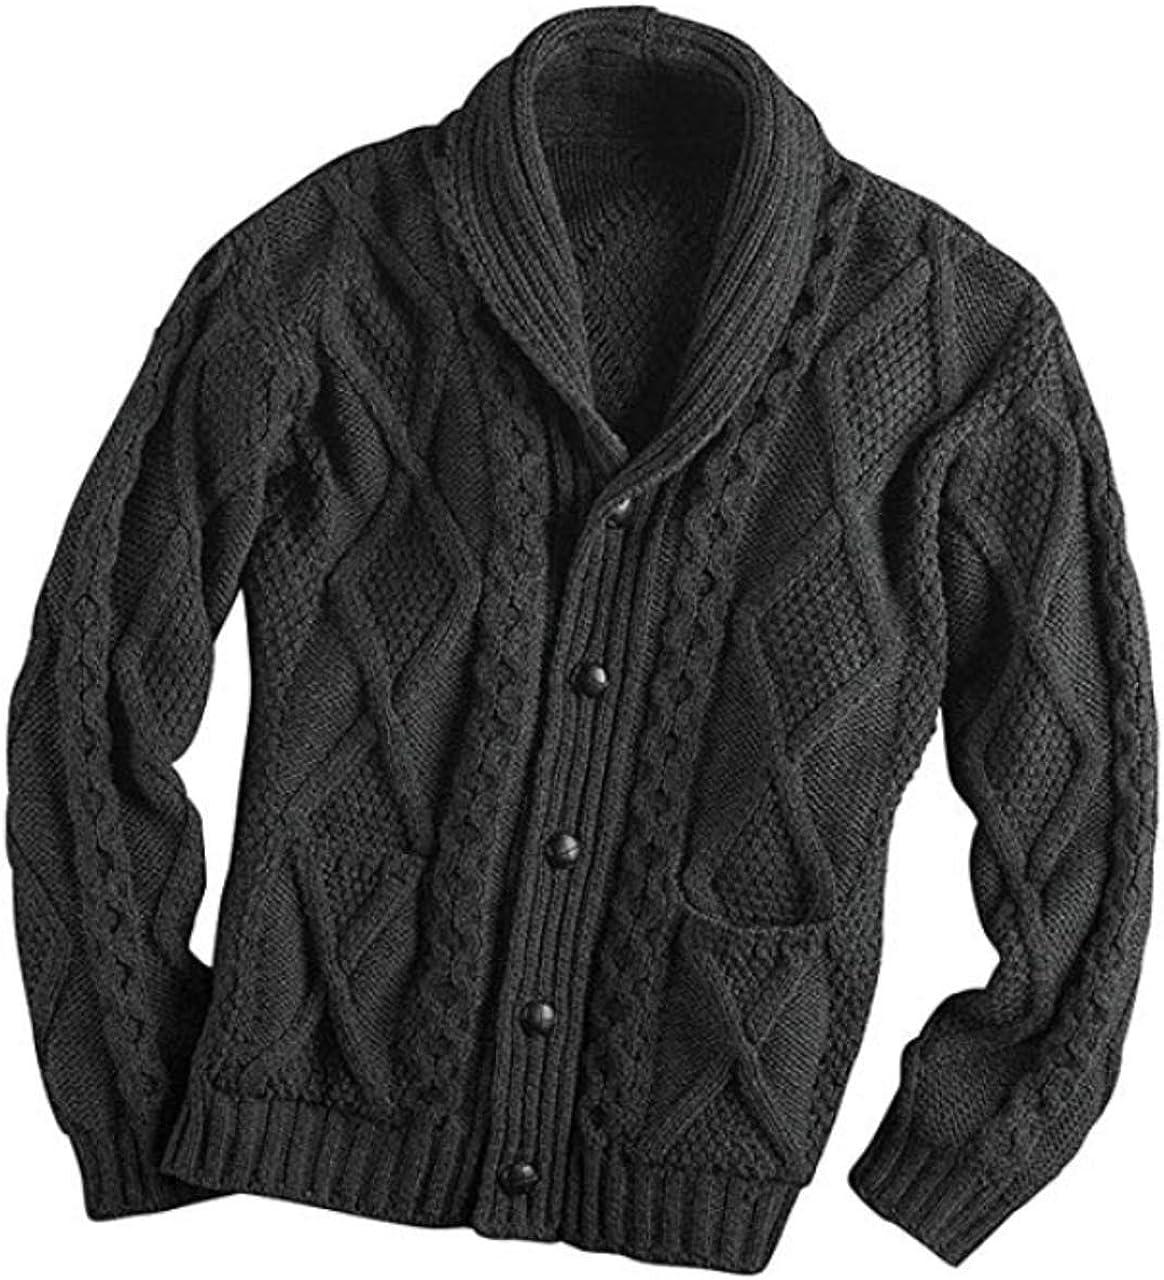 Free P/&P Vintage Pure Wool Aran Collar Jumper Long Sleeve knit knitwear